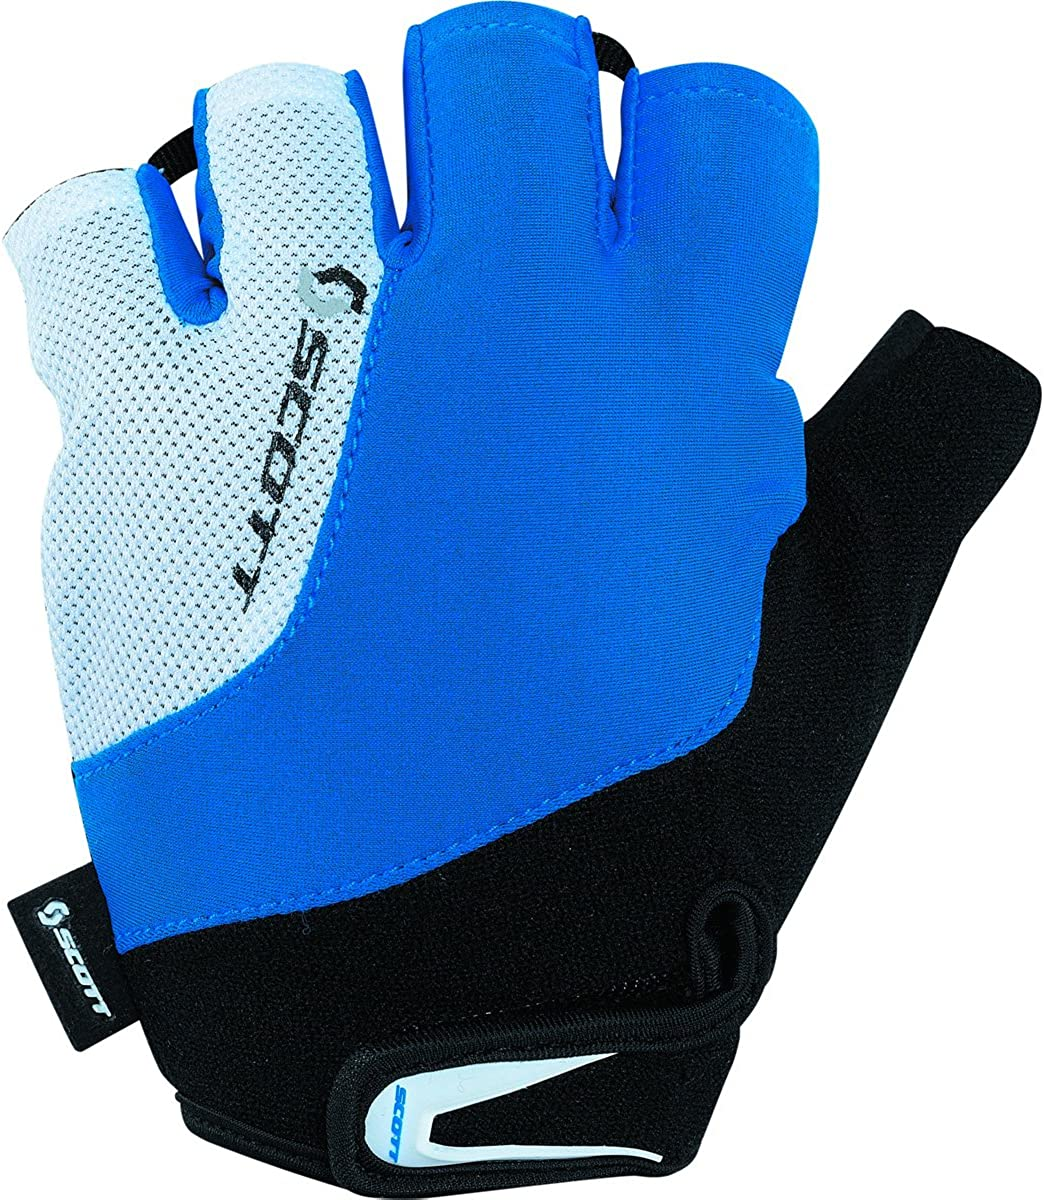 Scott Sports Mens Aspect service NEW Short Finger - Cycling Gloves B 227993